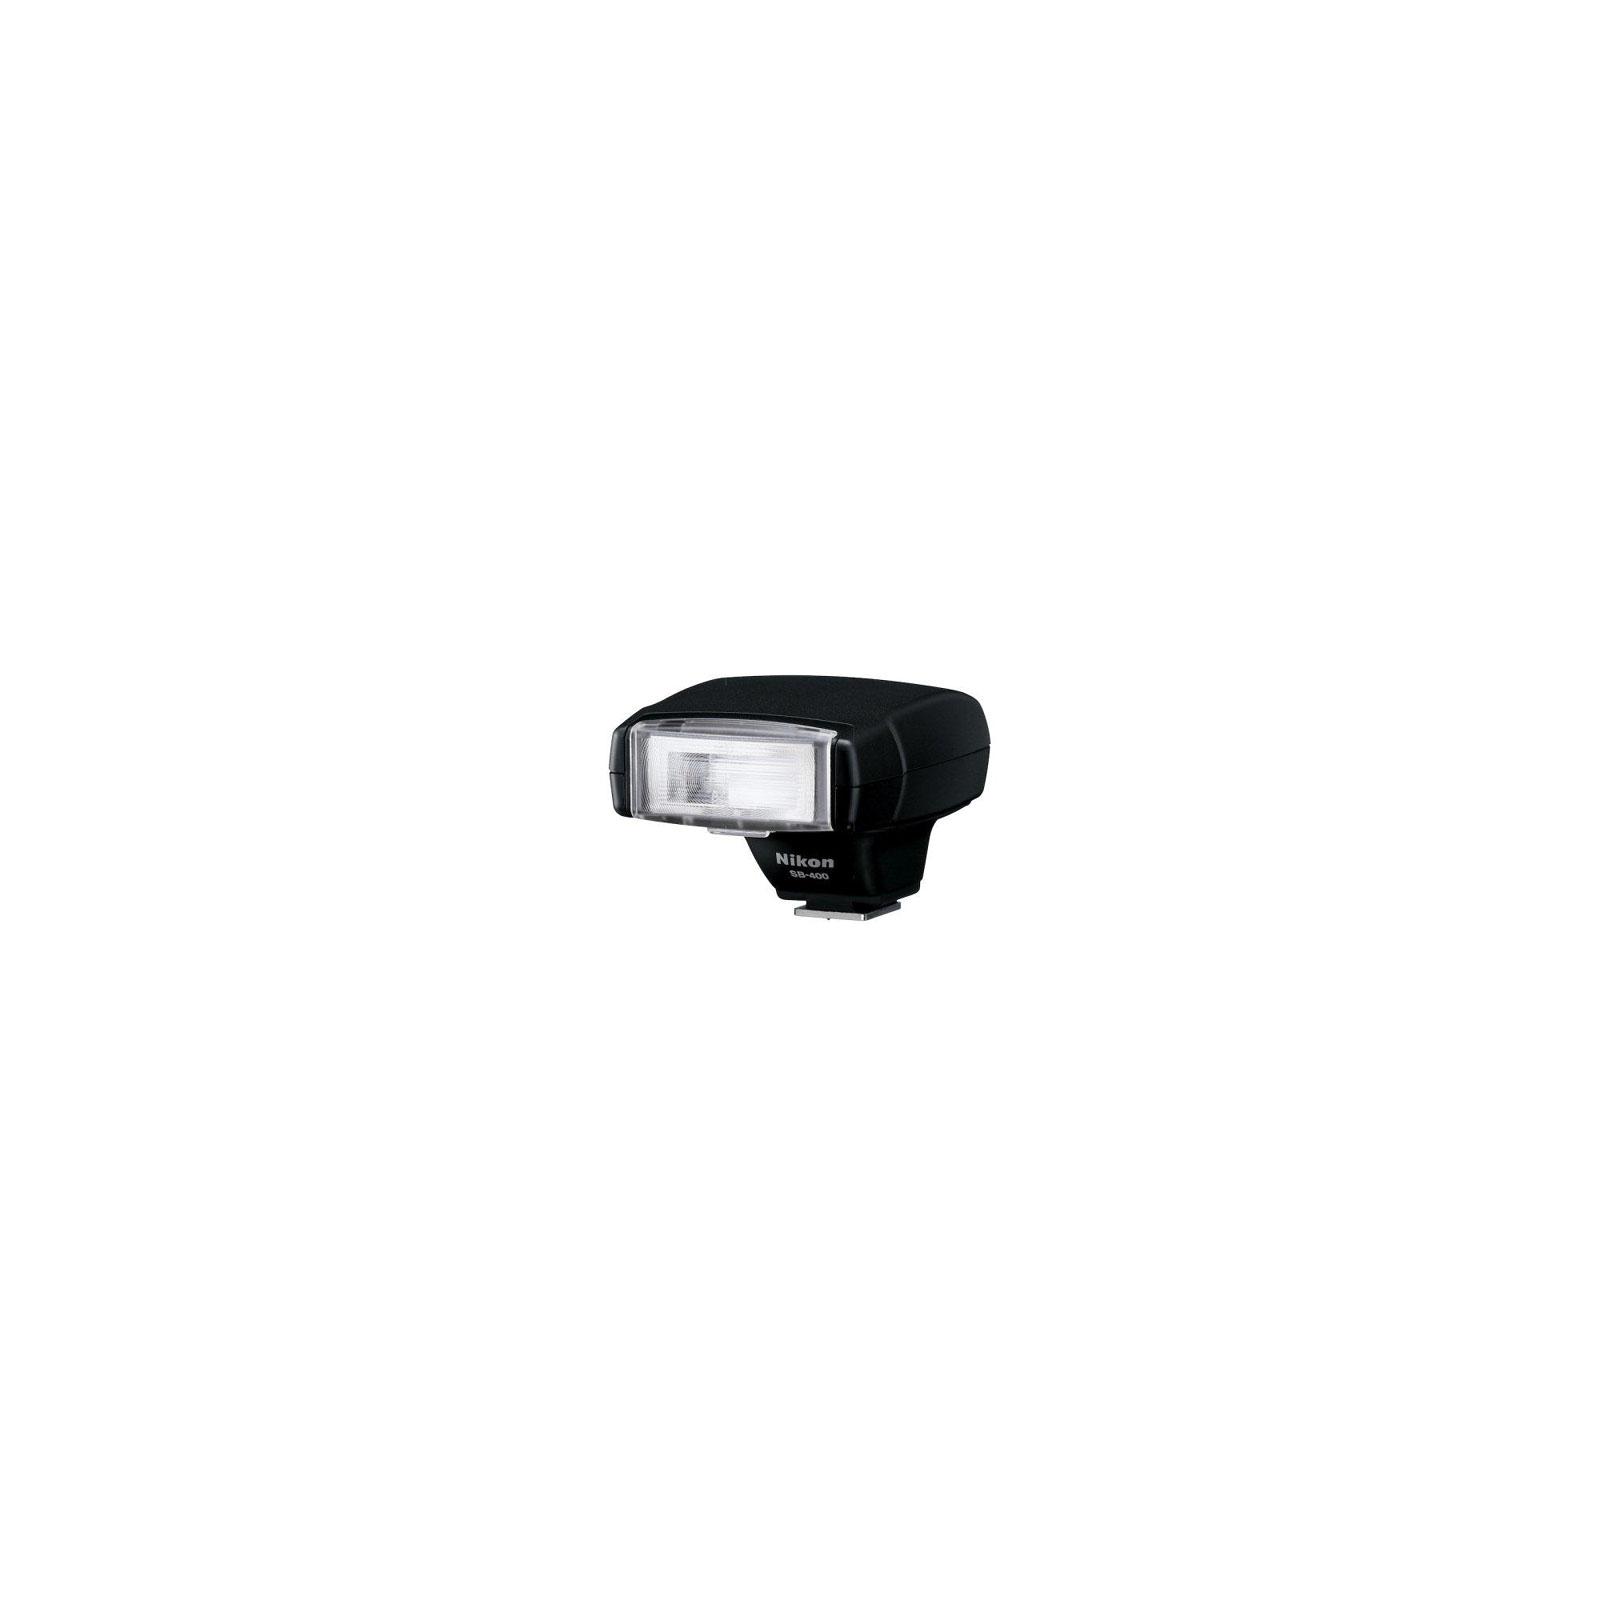 Вспышка Speedlight SB-400 Nikon (FSA03701)